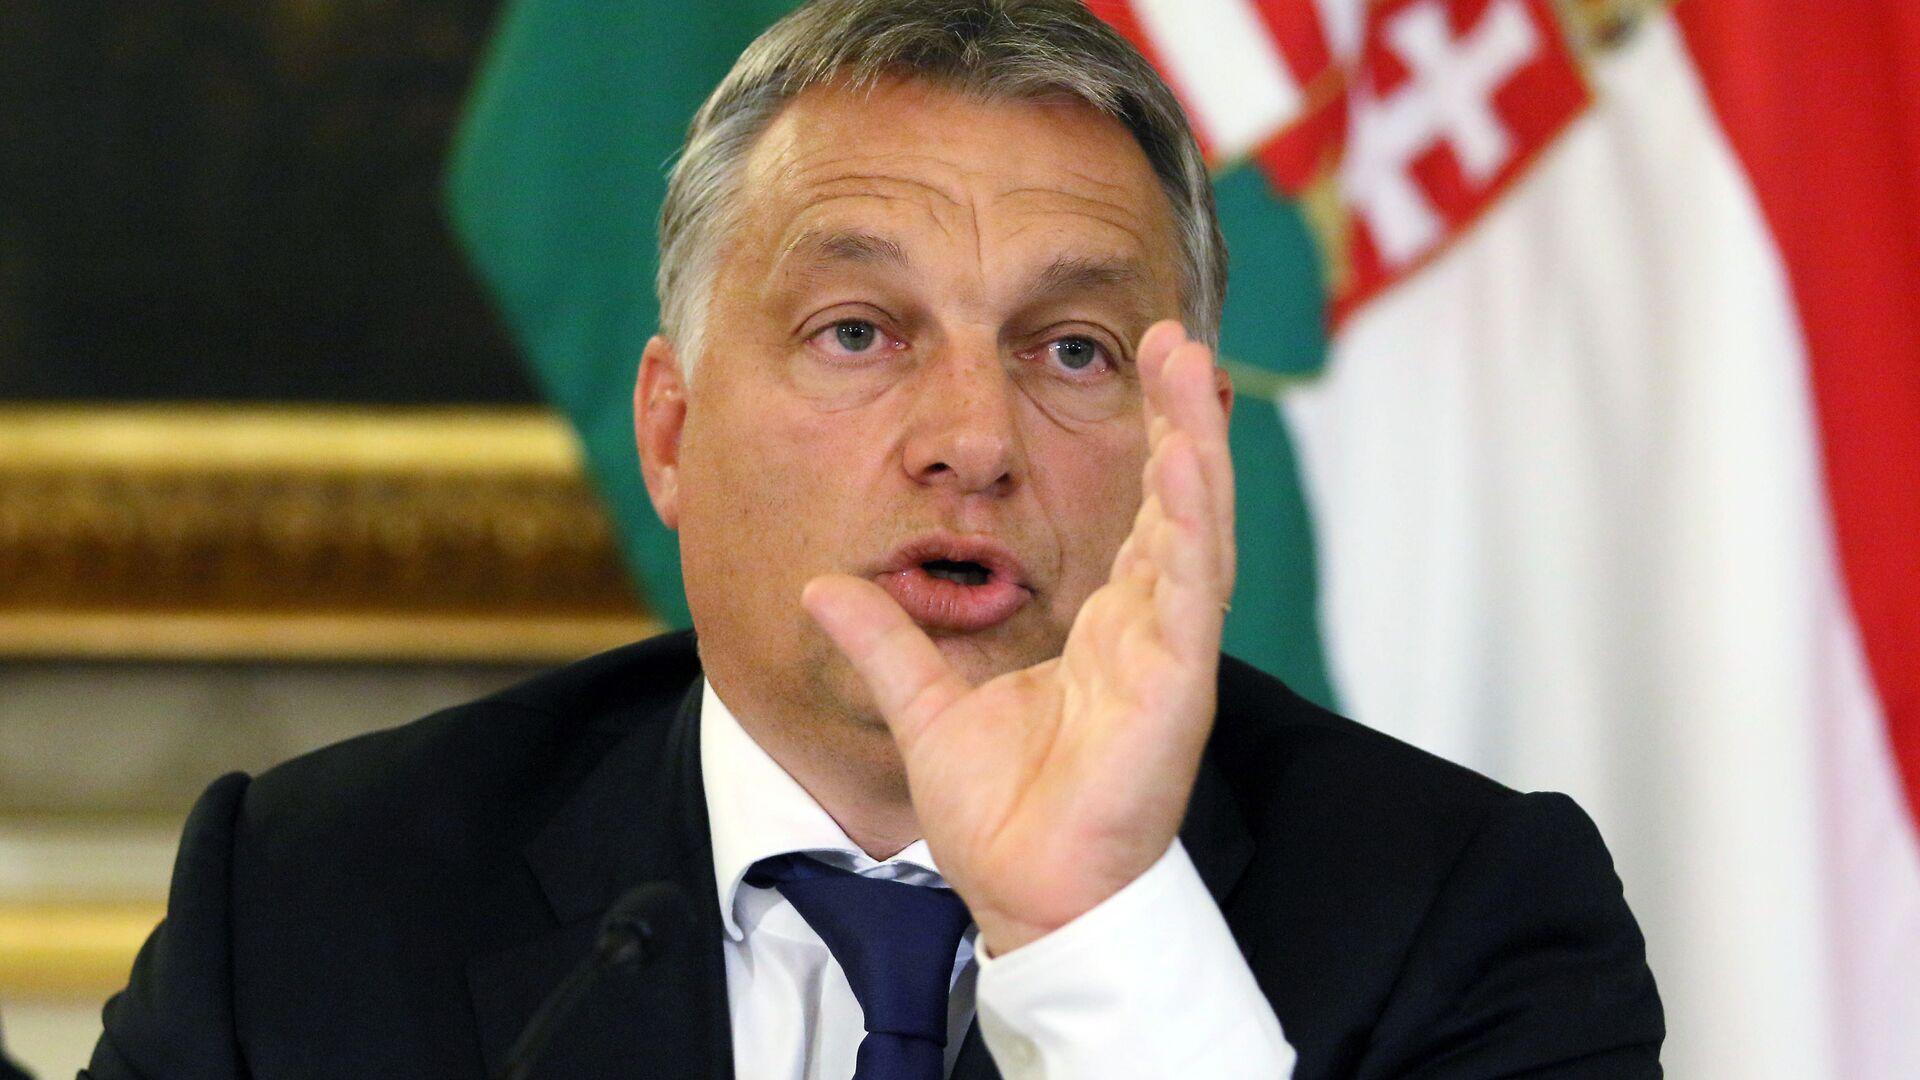 Il premier ungherese Viktor Orban - Sputnik Italia, 1920, 29.09.2021